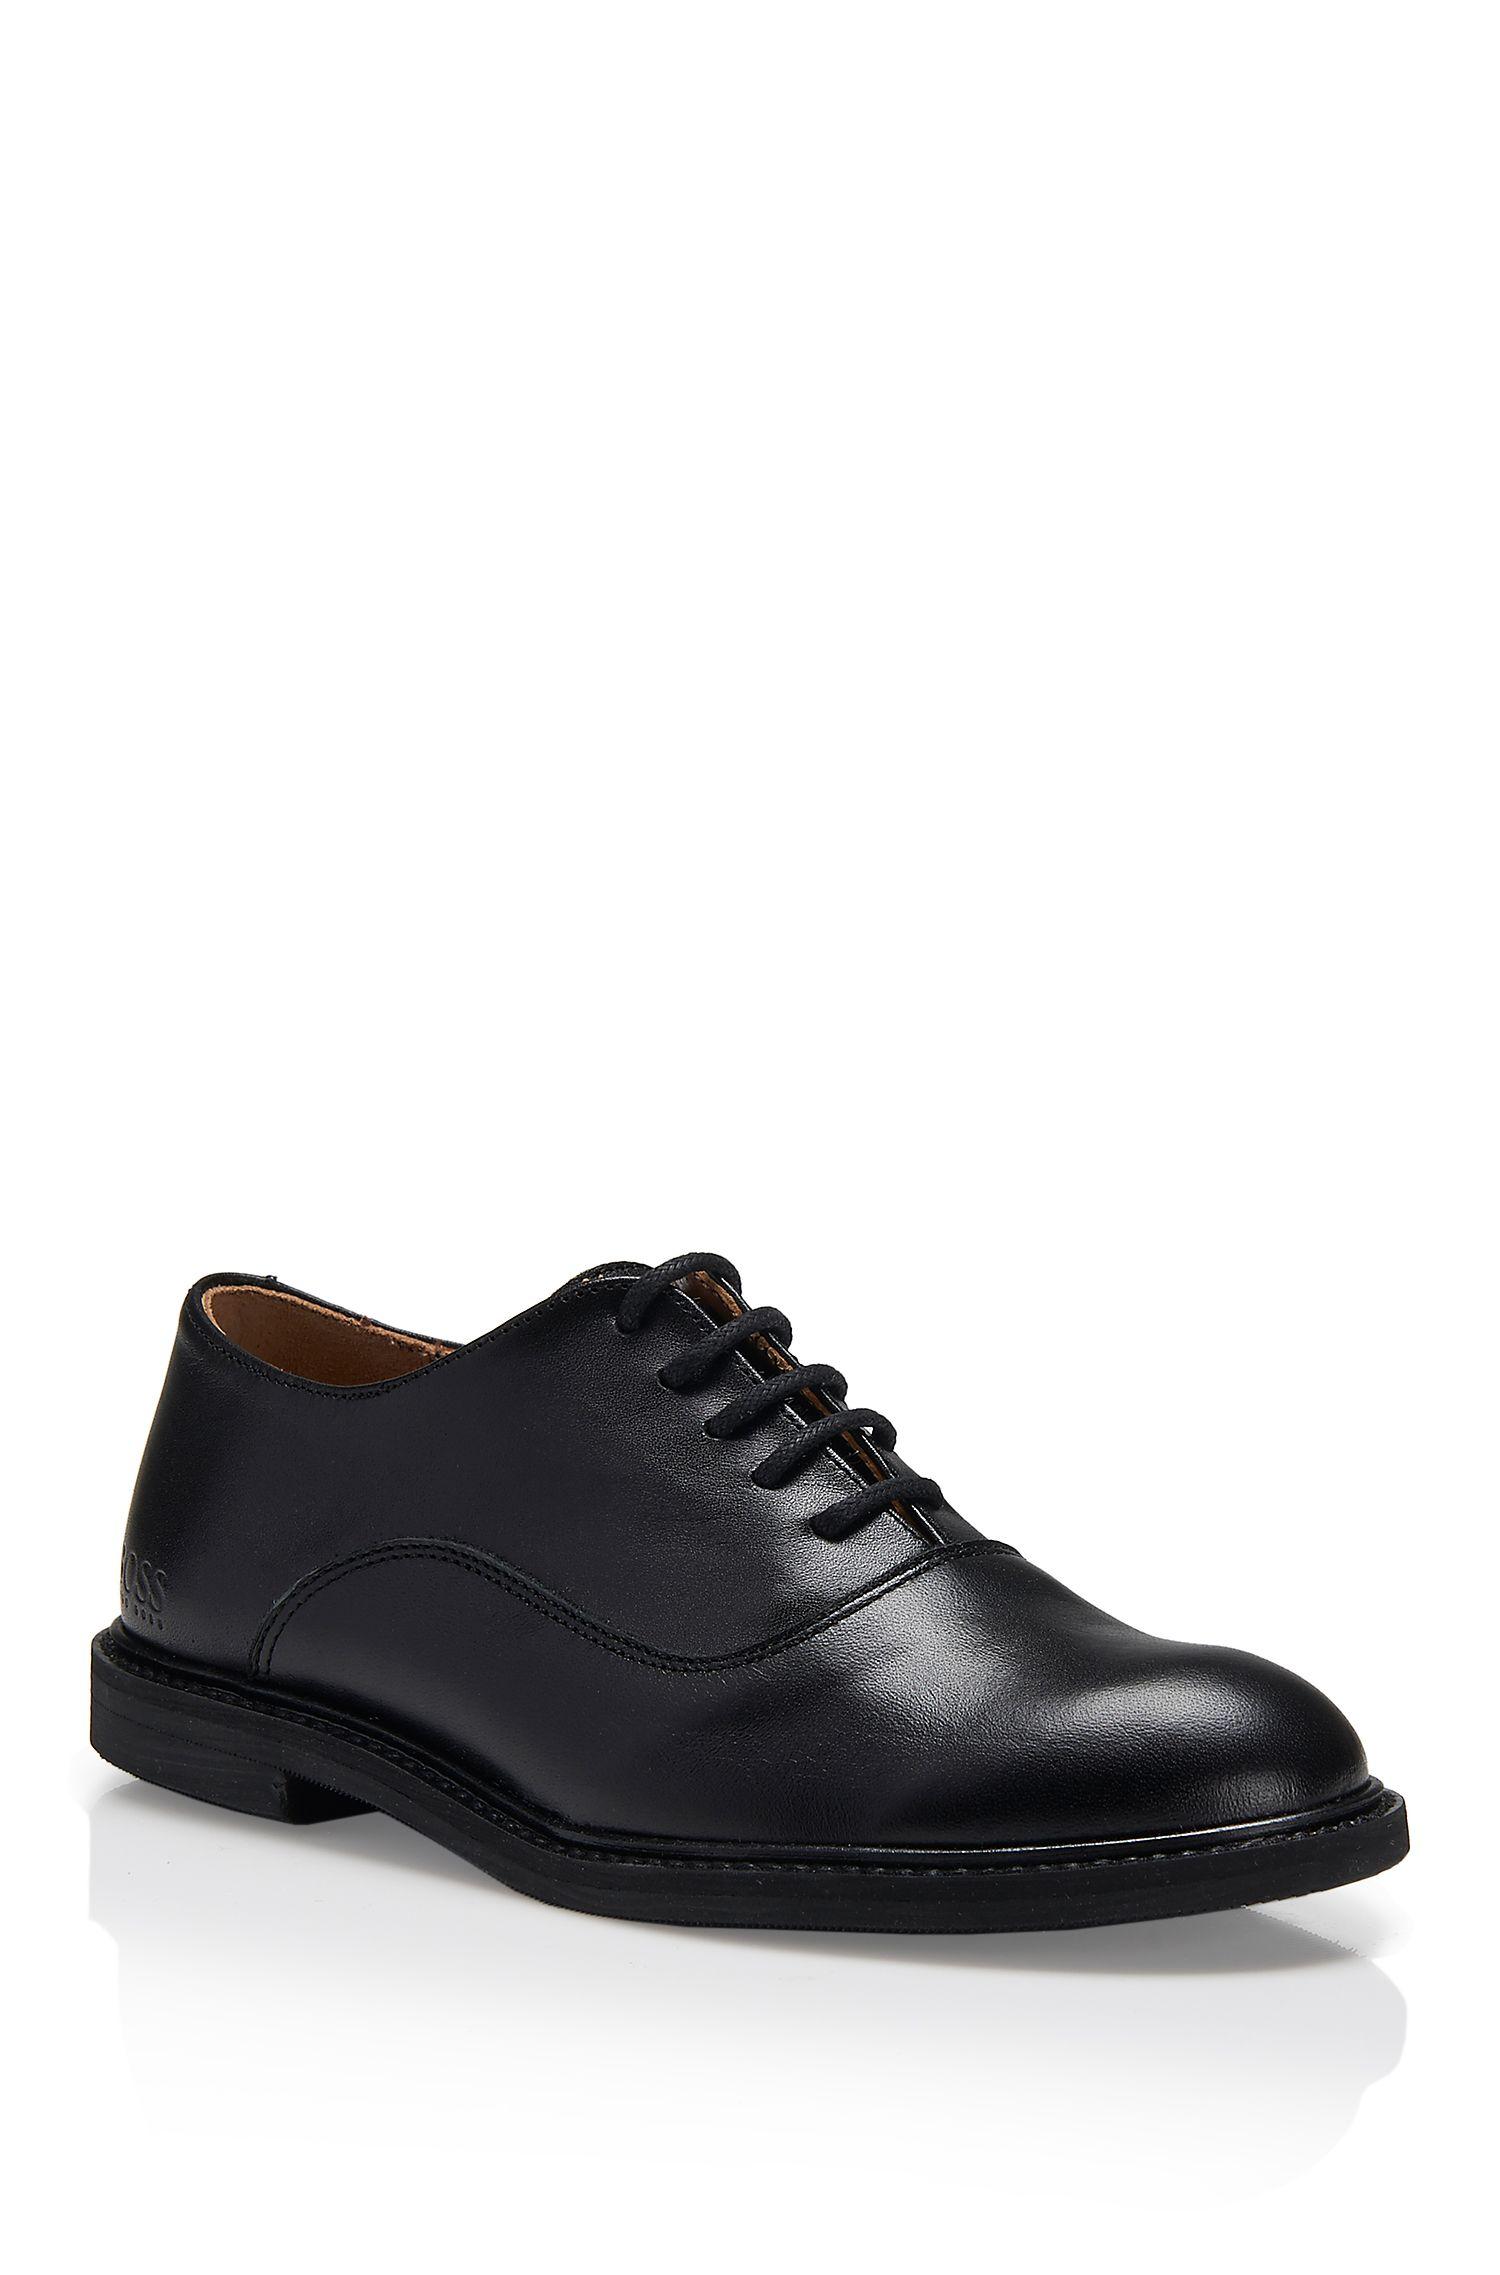 'J29097'   Boys Leather Derby Shoes